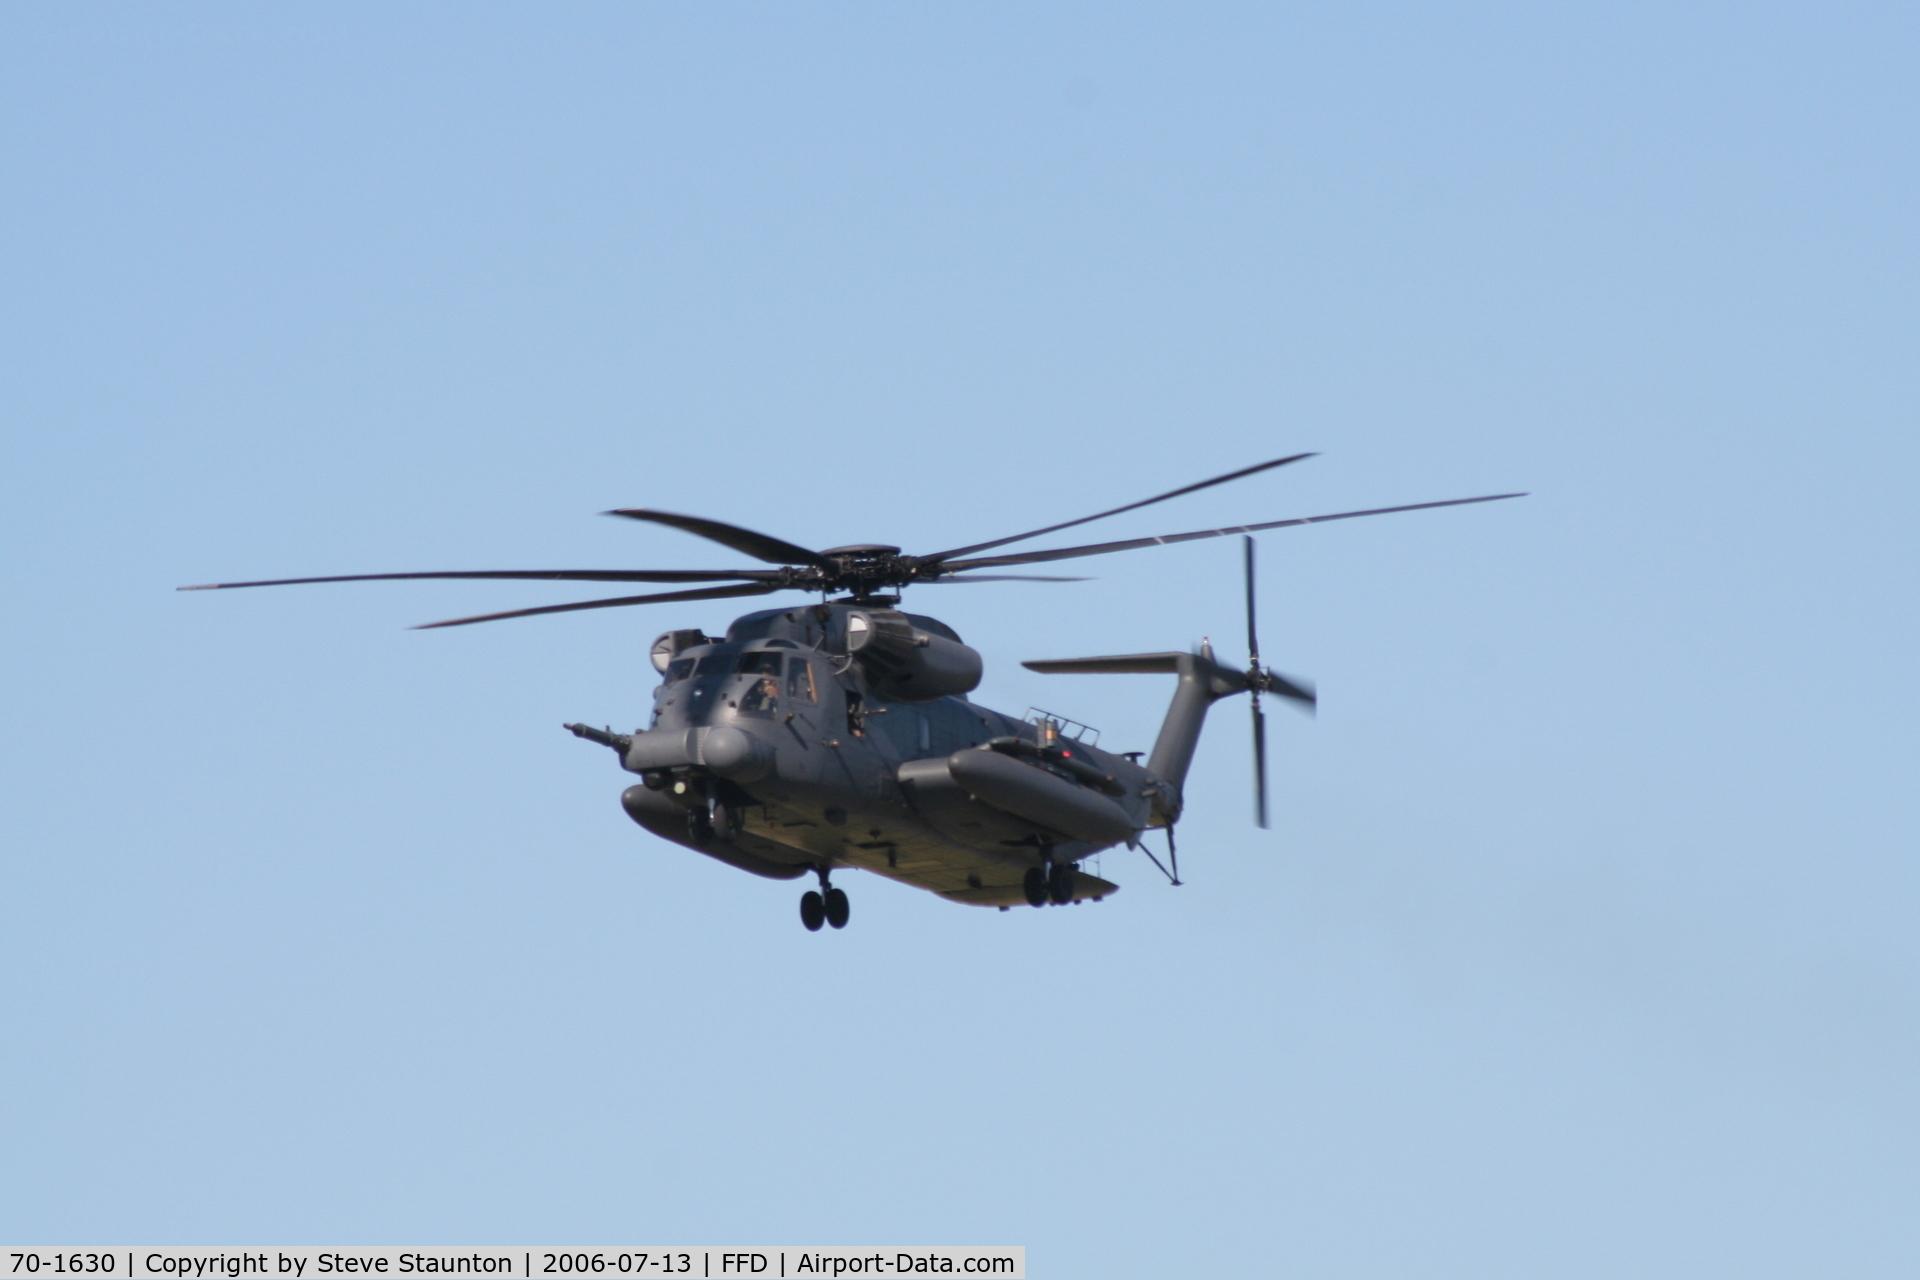 70-1630, 1970 Sikorsky MH-53M Pave Low IV C/N 65-340, Royal International Air Tattoo 2006